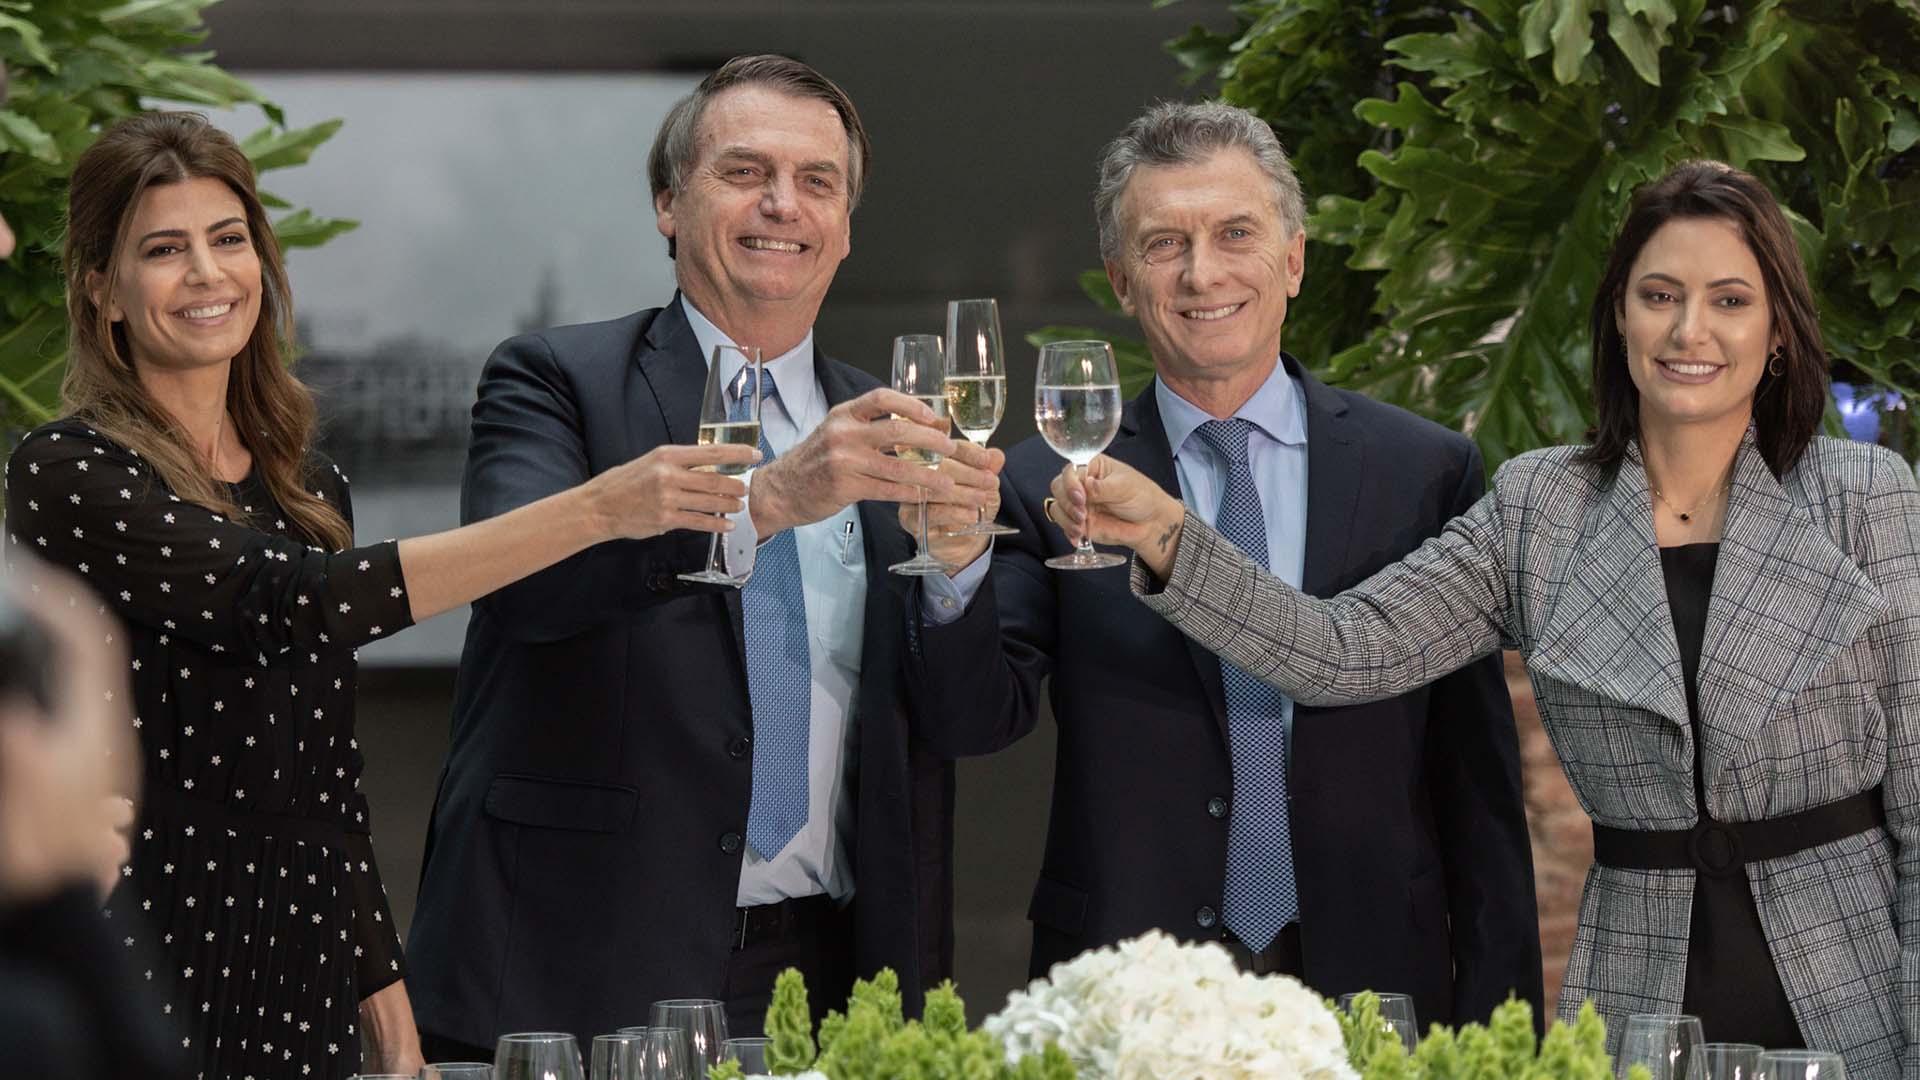 Juliana Awada, Jair Bolsonaro, Mauricio Macri, Michelle Bolsonaro